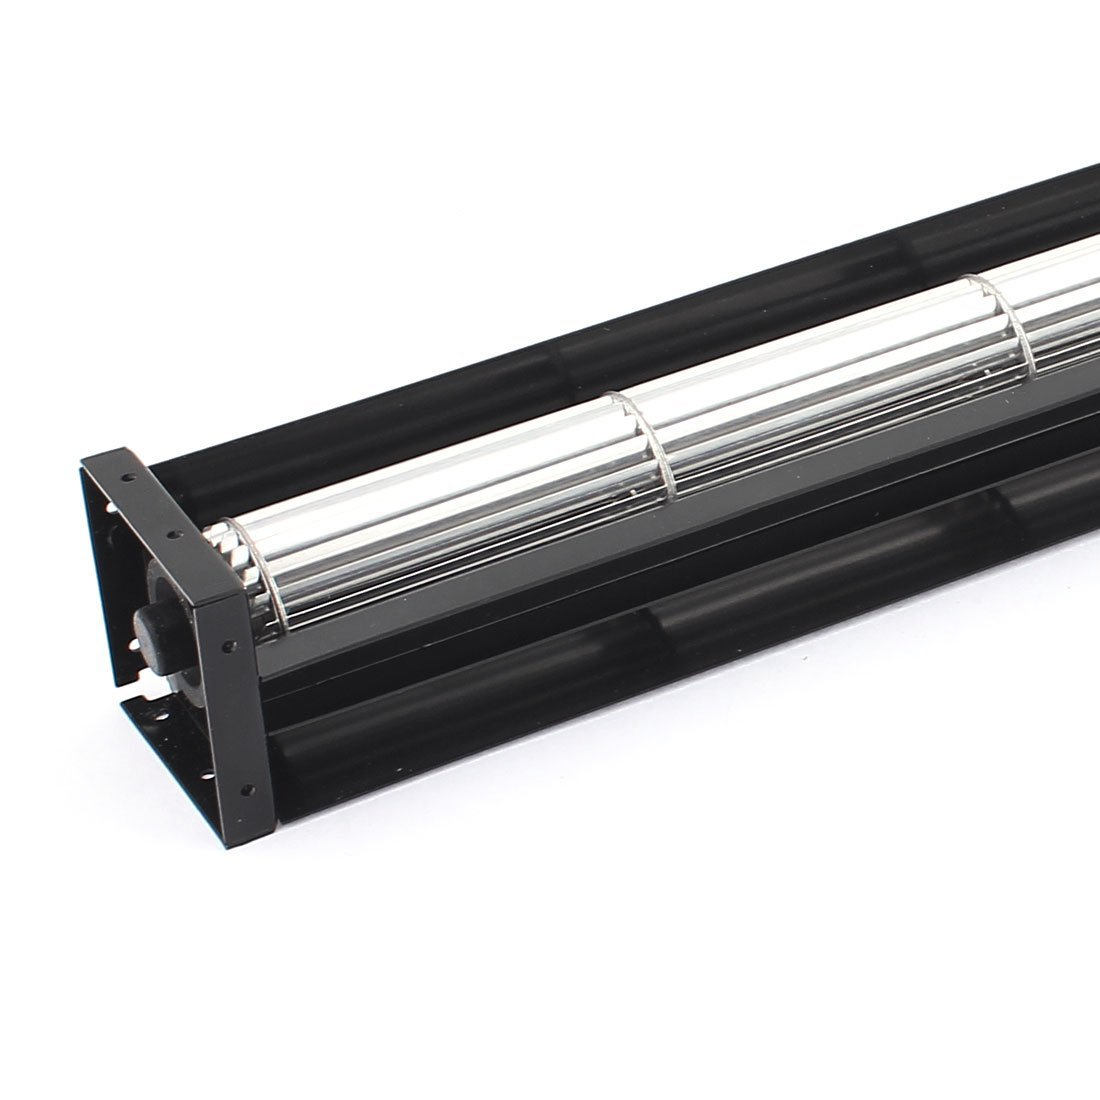 Amazon.com: eDealMax DC 12V 0.27A Cross Flow refrigeración Amplificador de calor ventilador suplementario Turbo 30x290mm: Electronics